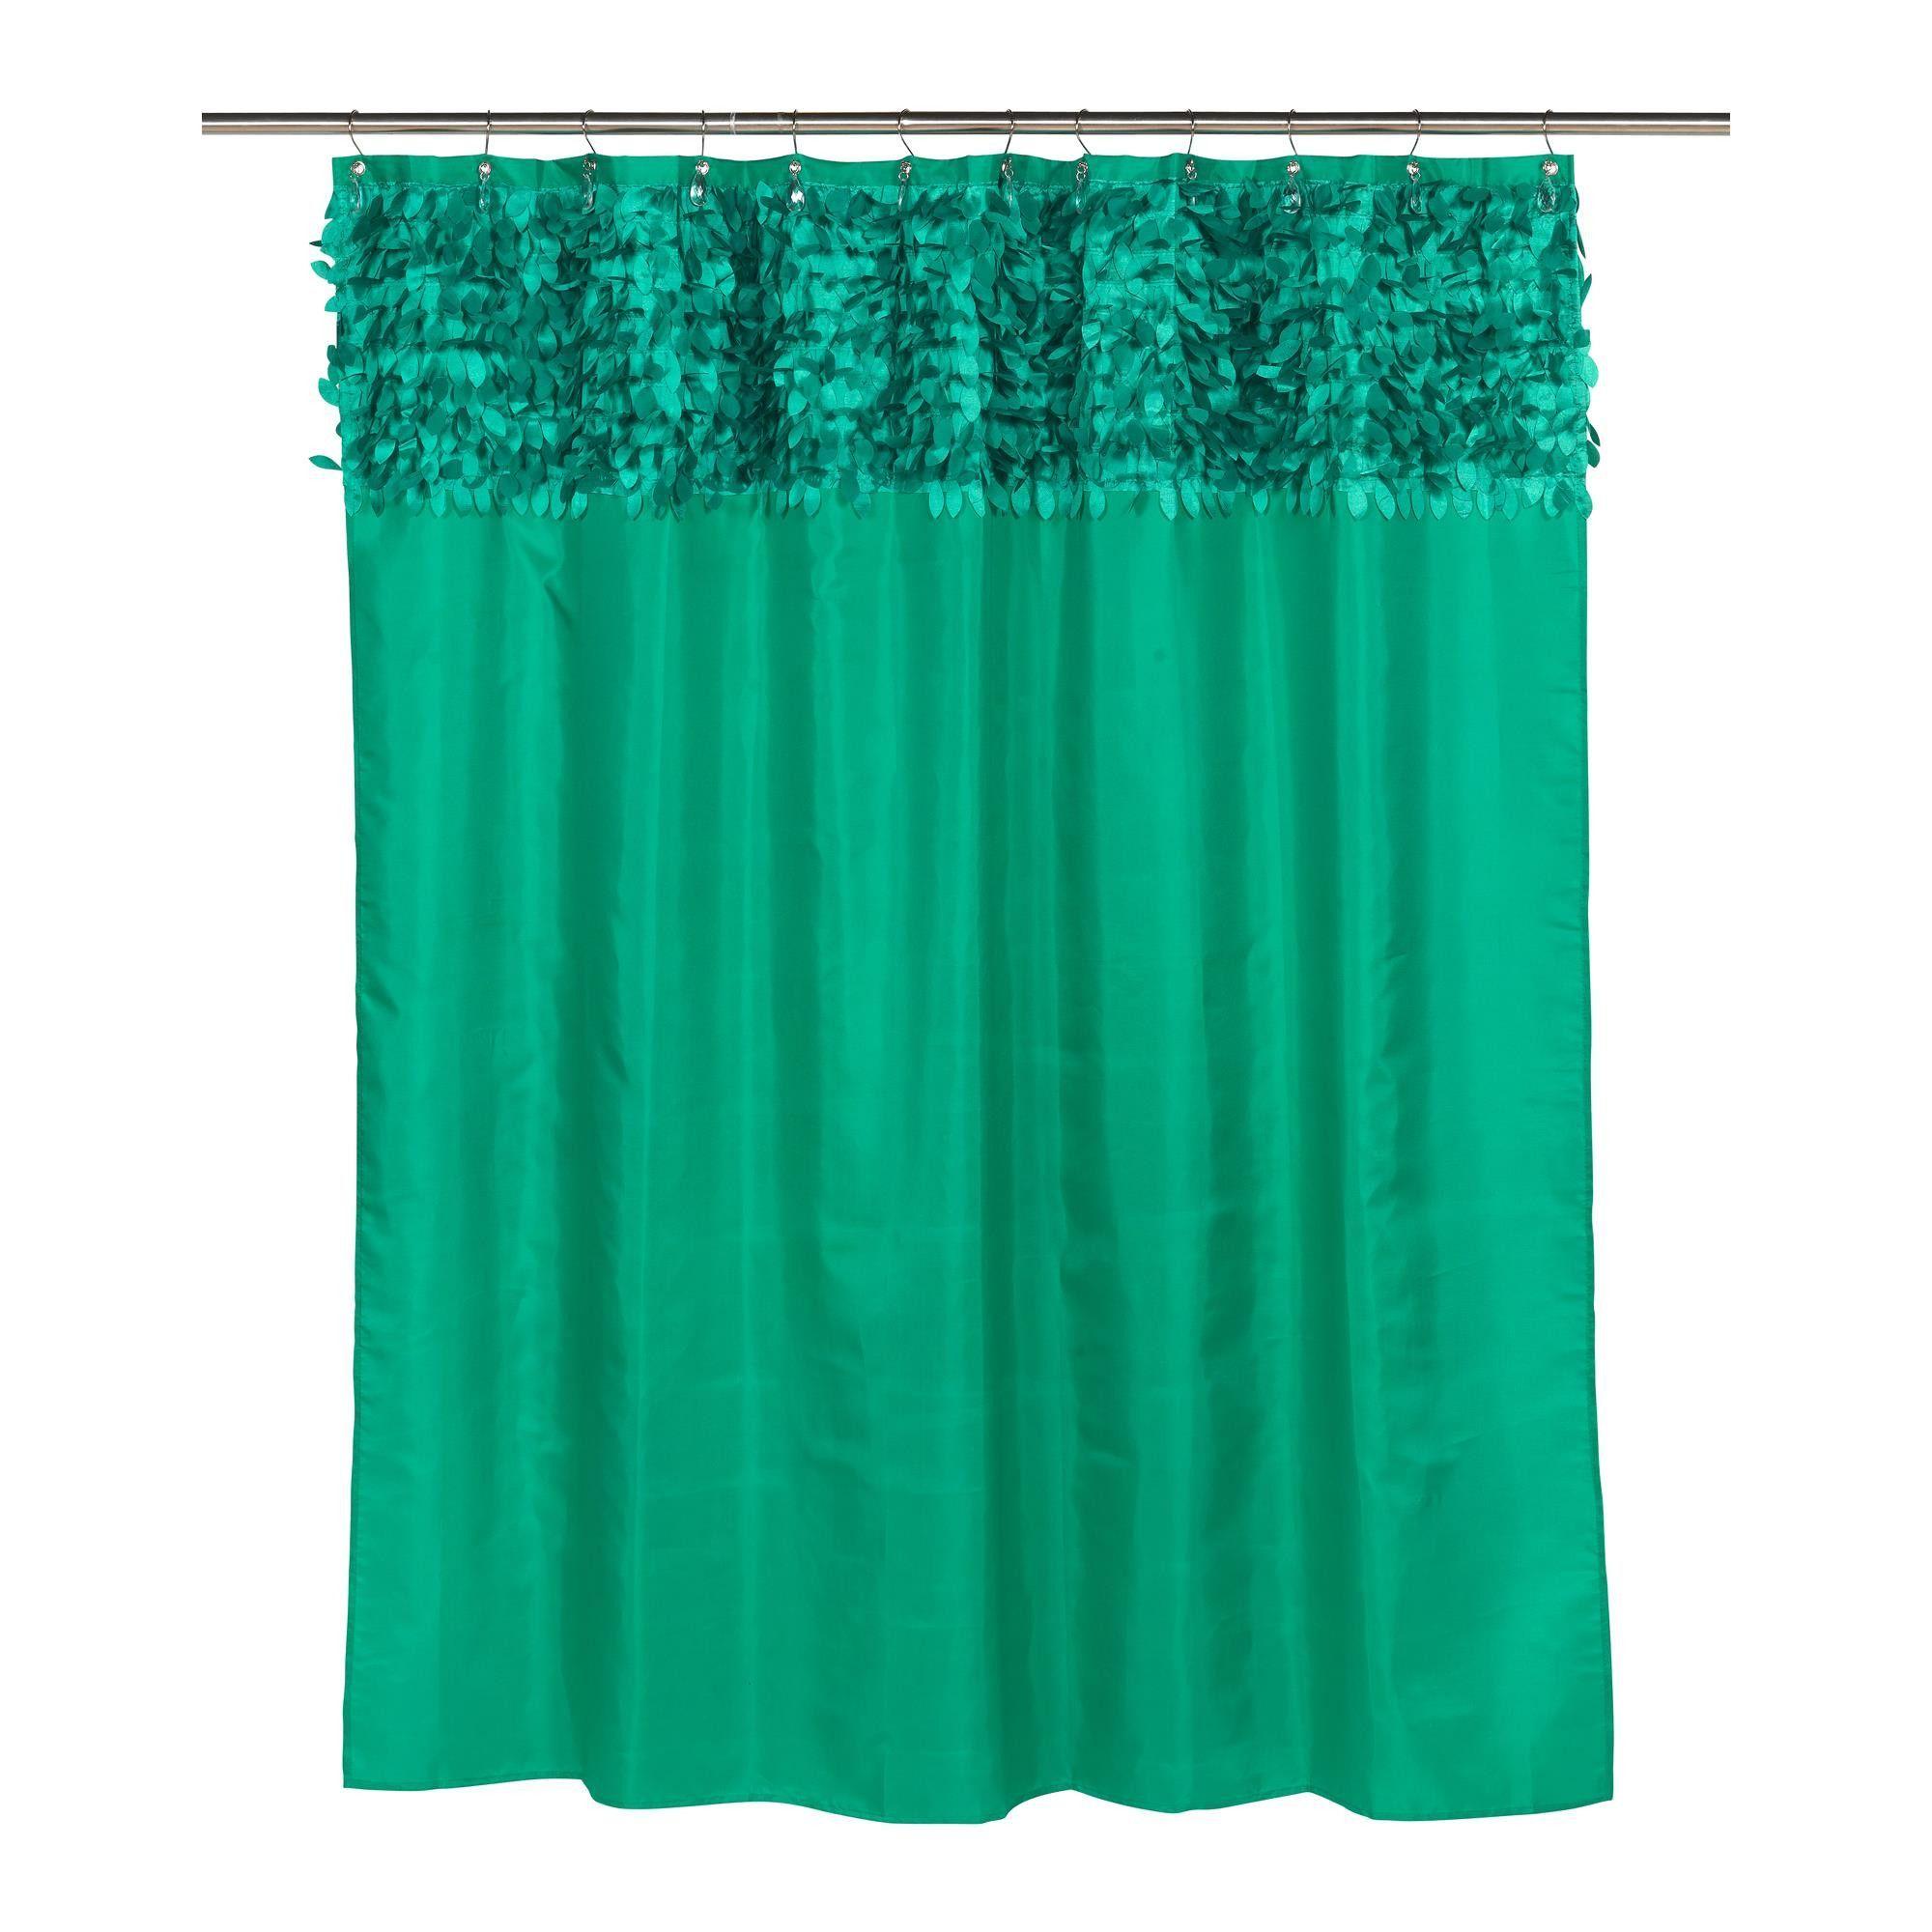 Wildflower Emerald Shower Curtain Default Title Green Shower